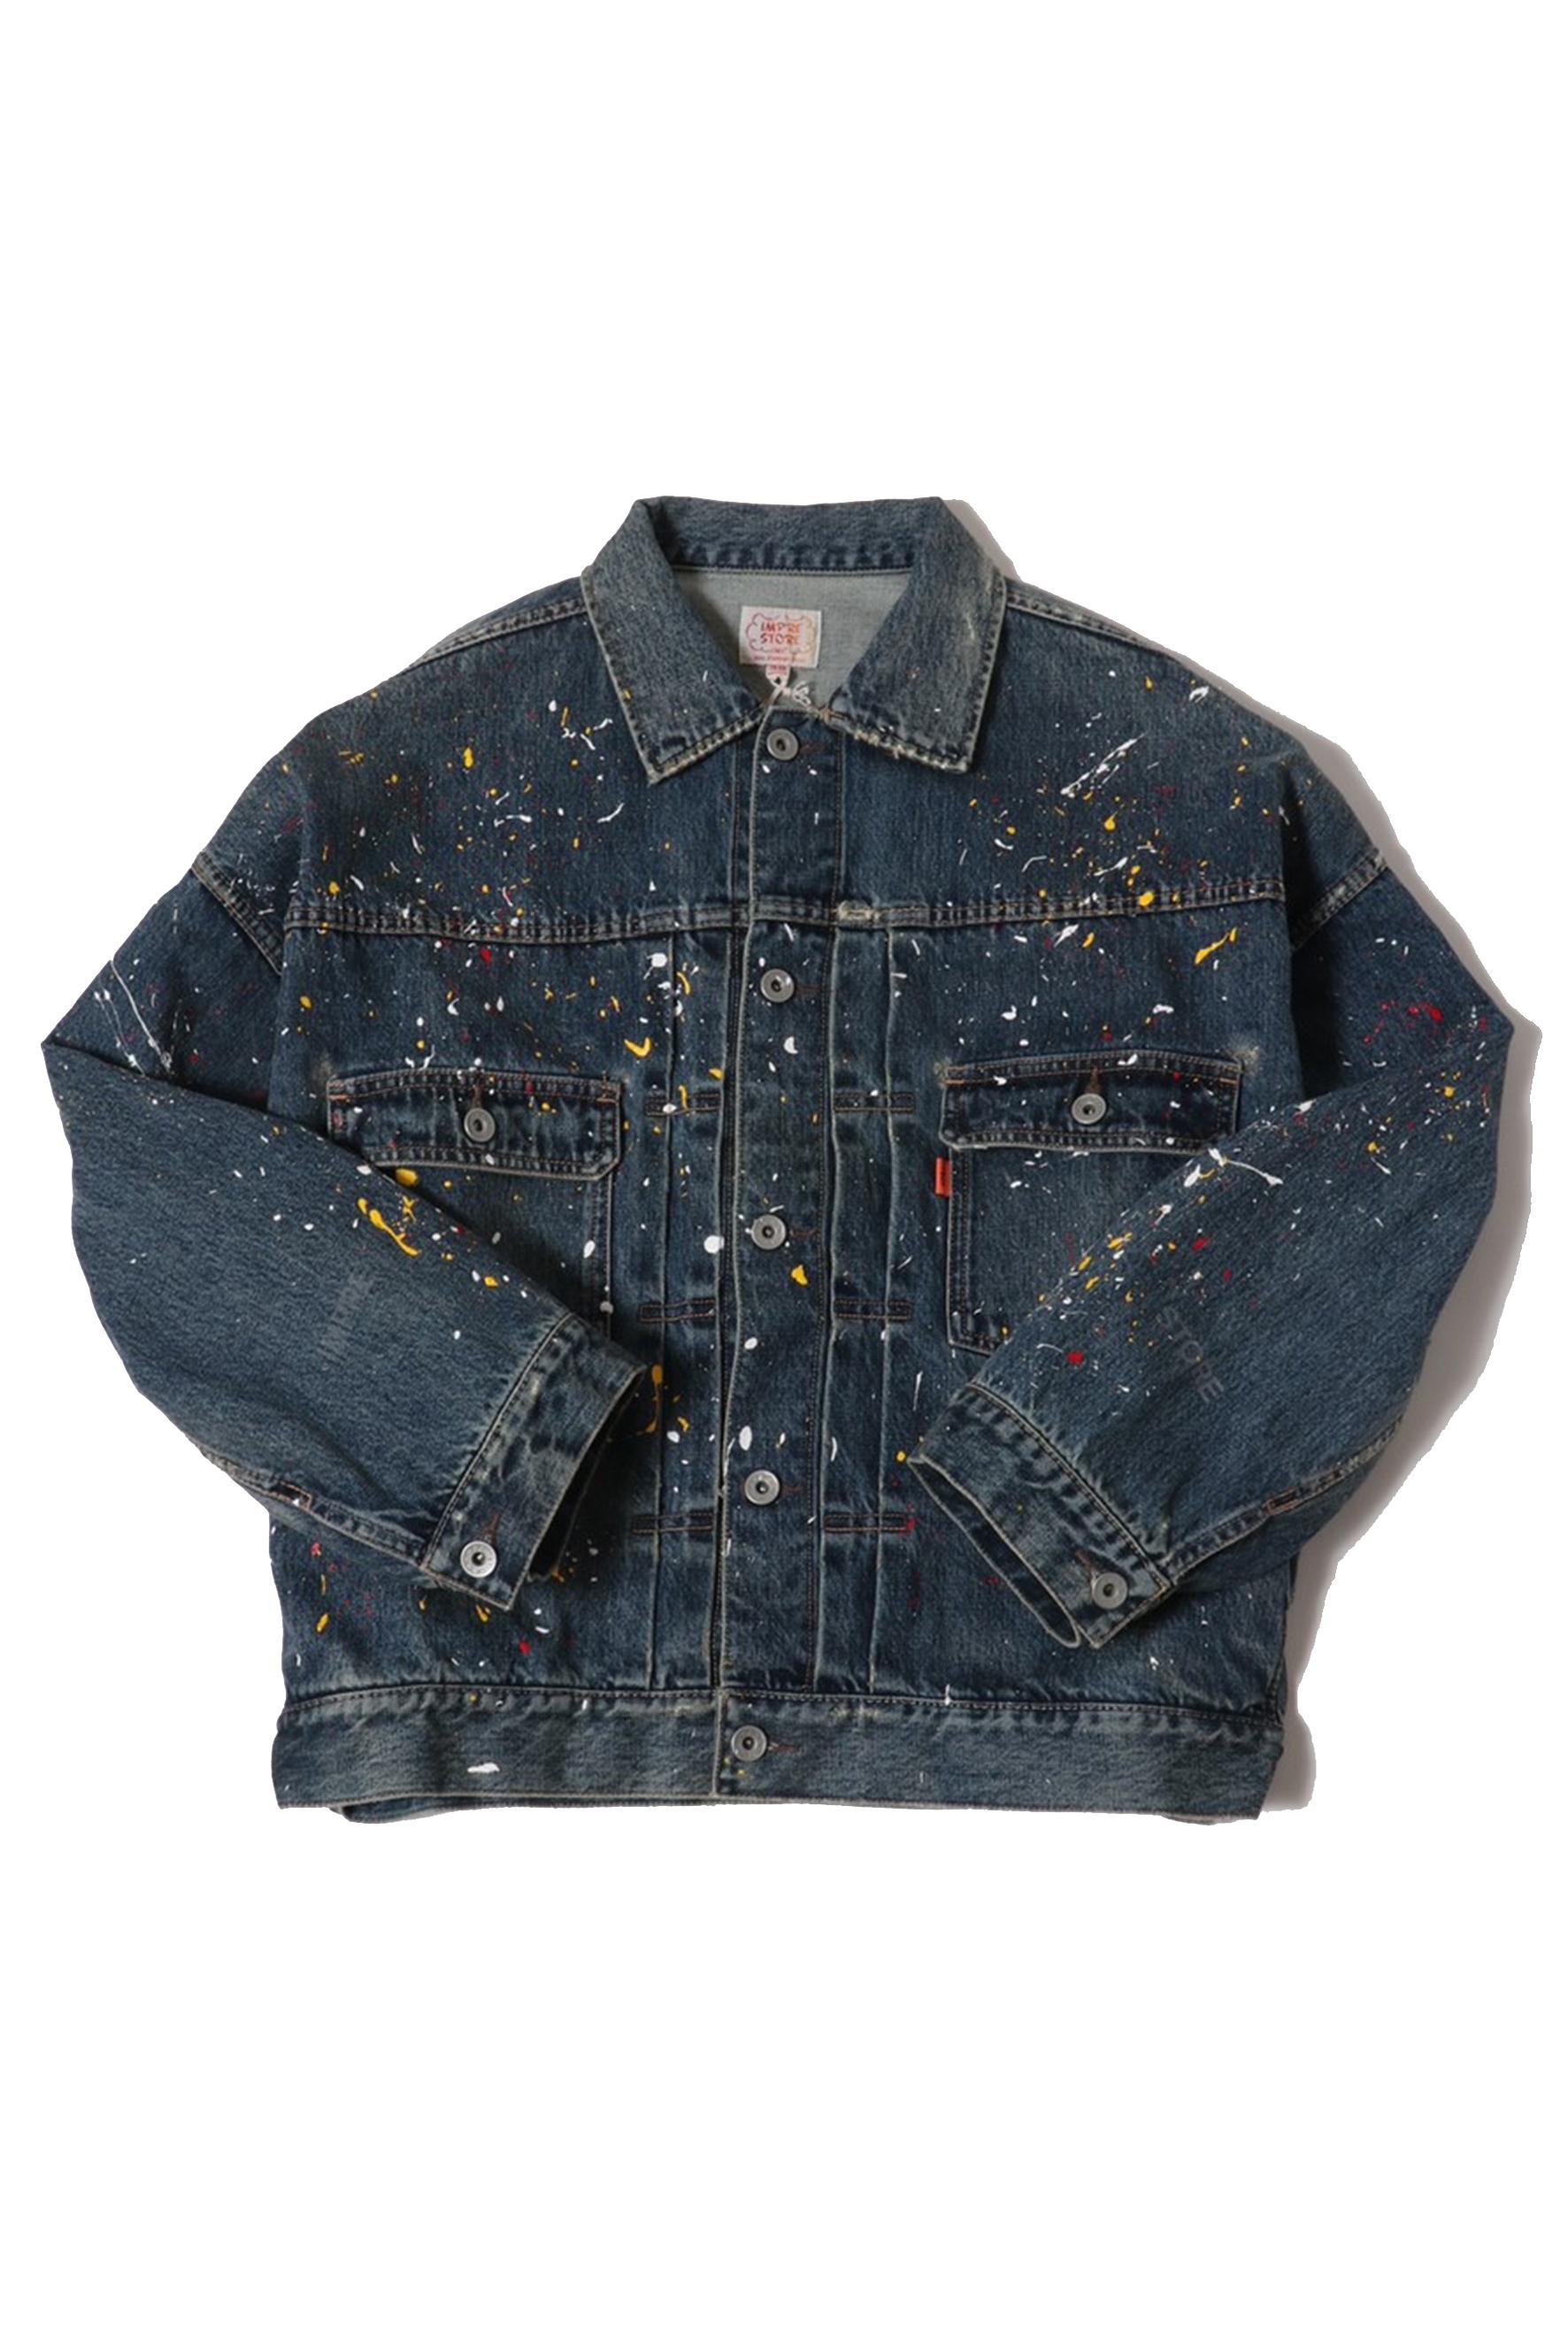 12.5oz Denim Jacket / vintage paint